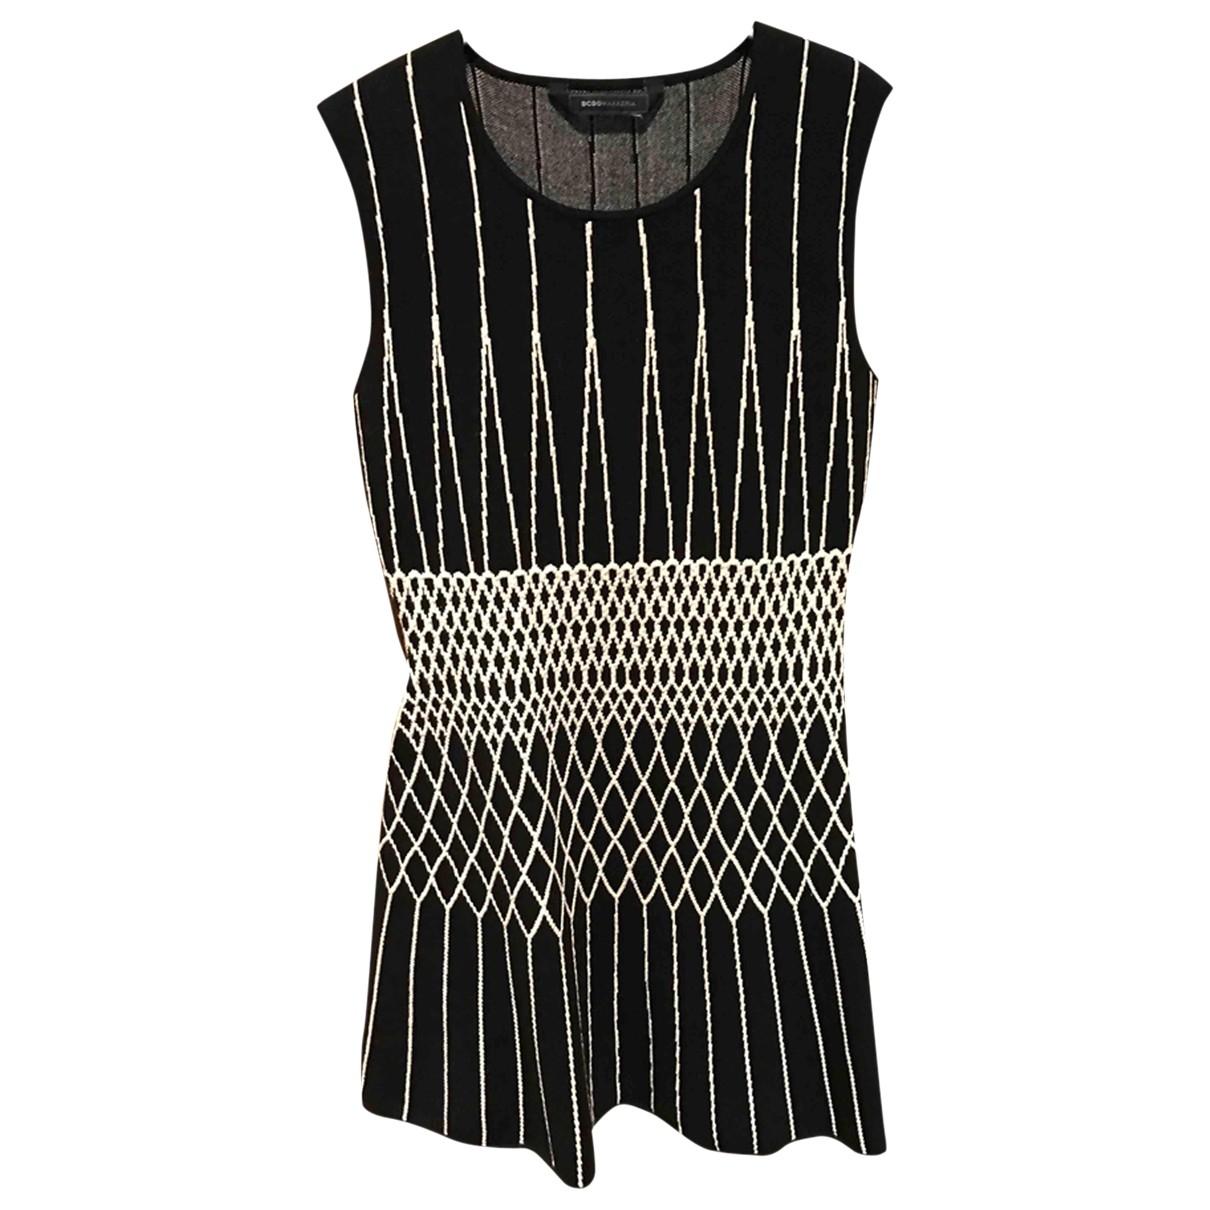 Bcbg Max Azria \N Black dress for Women M International